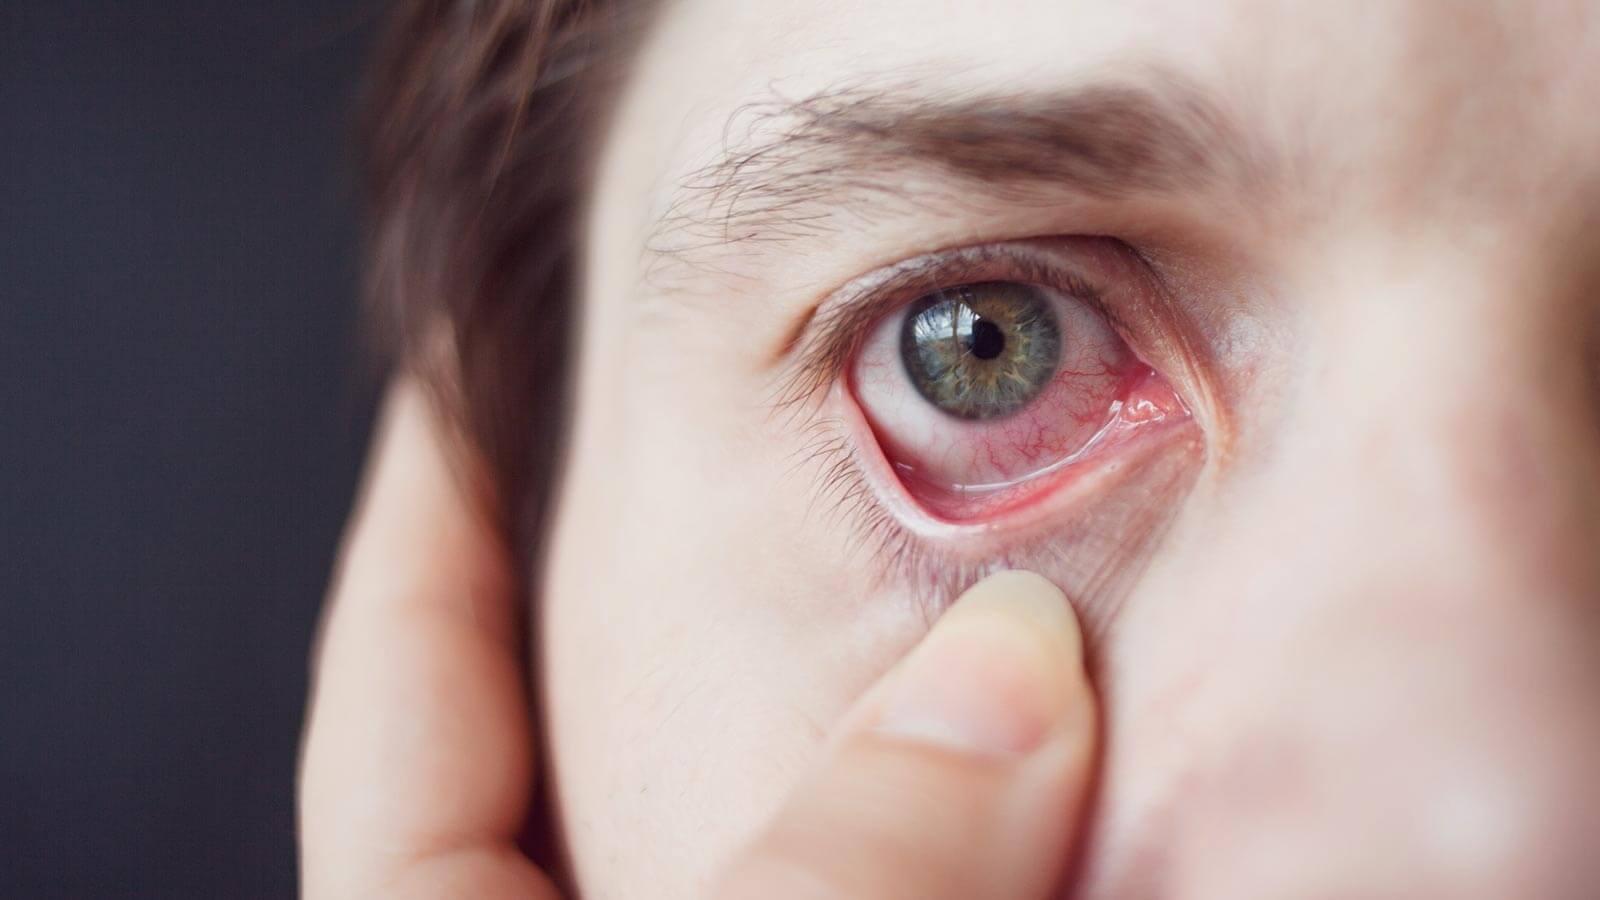 Symptoms Foreign Object in Eye